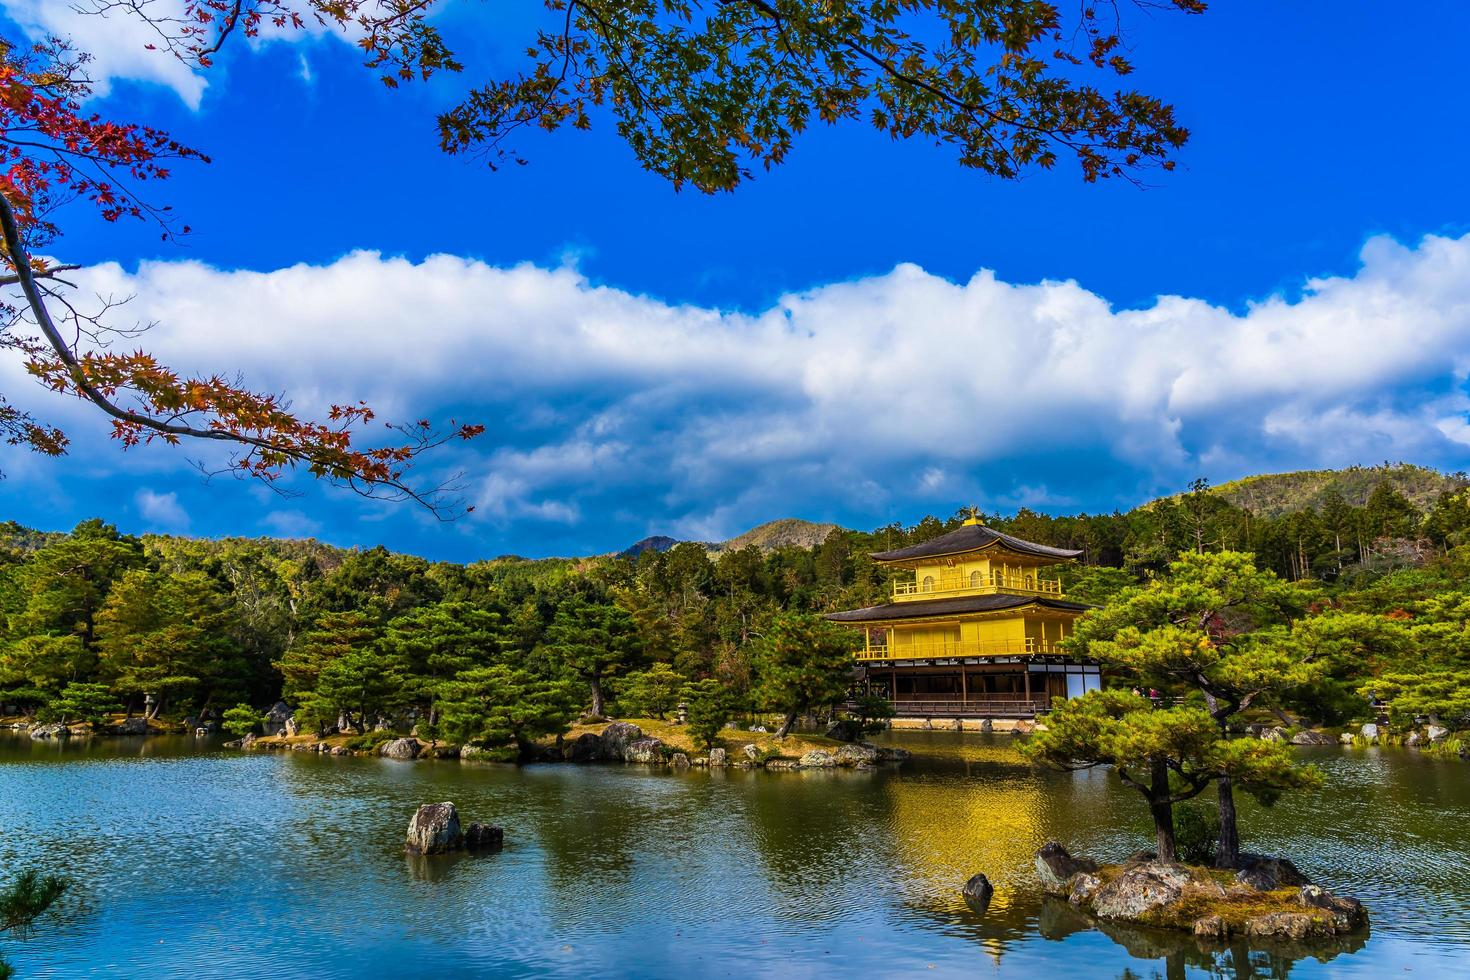 Kinkakuji temple or Golden Pavillion in Kyoto, Japan photo